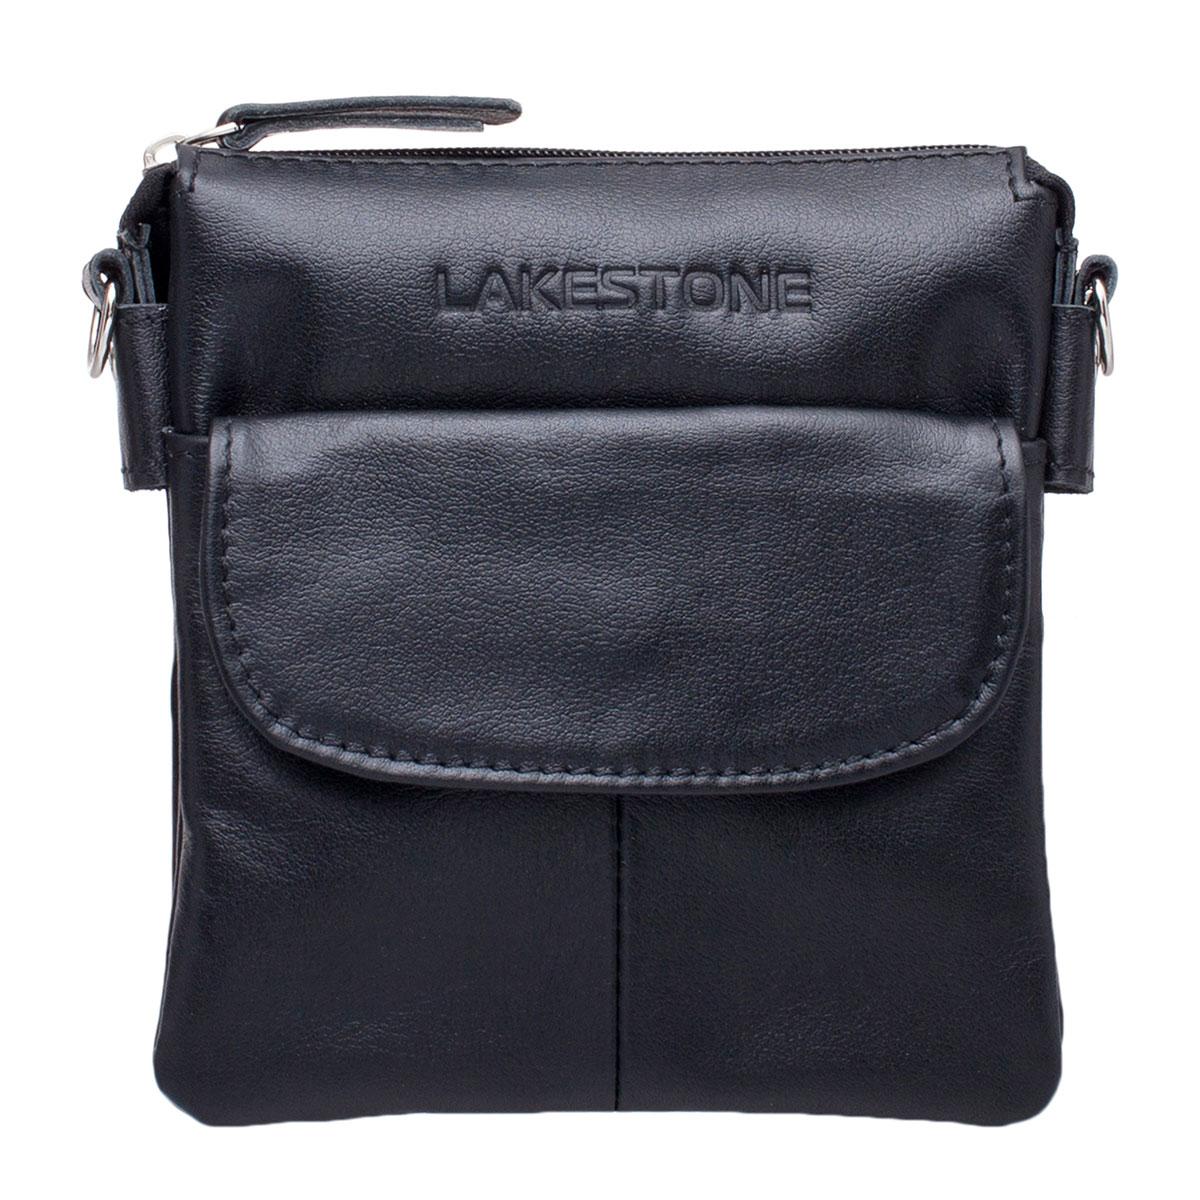 "Сумка ""Lakestone"" Osborne Black от Lakestone"